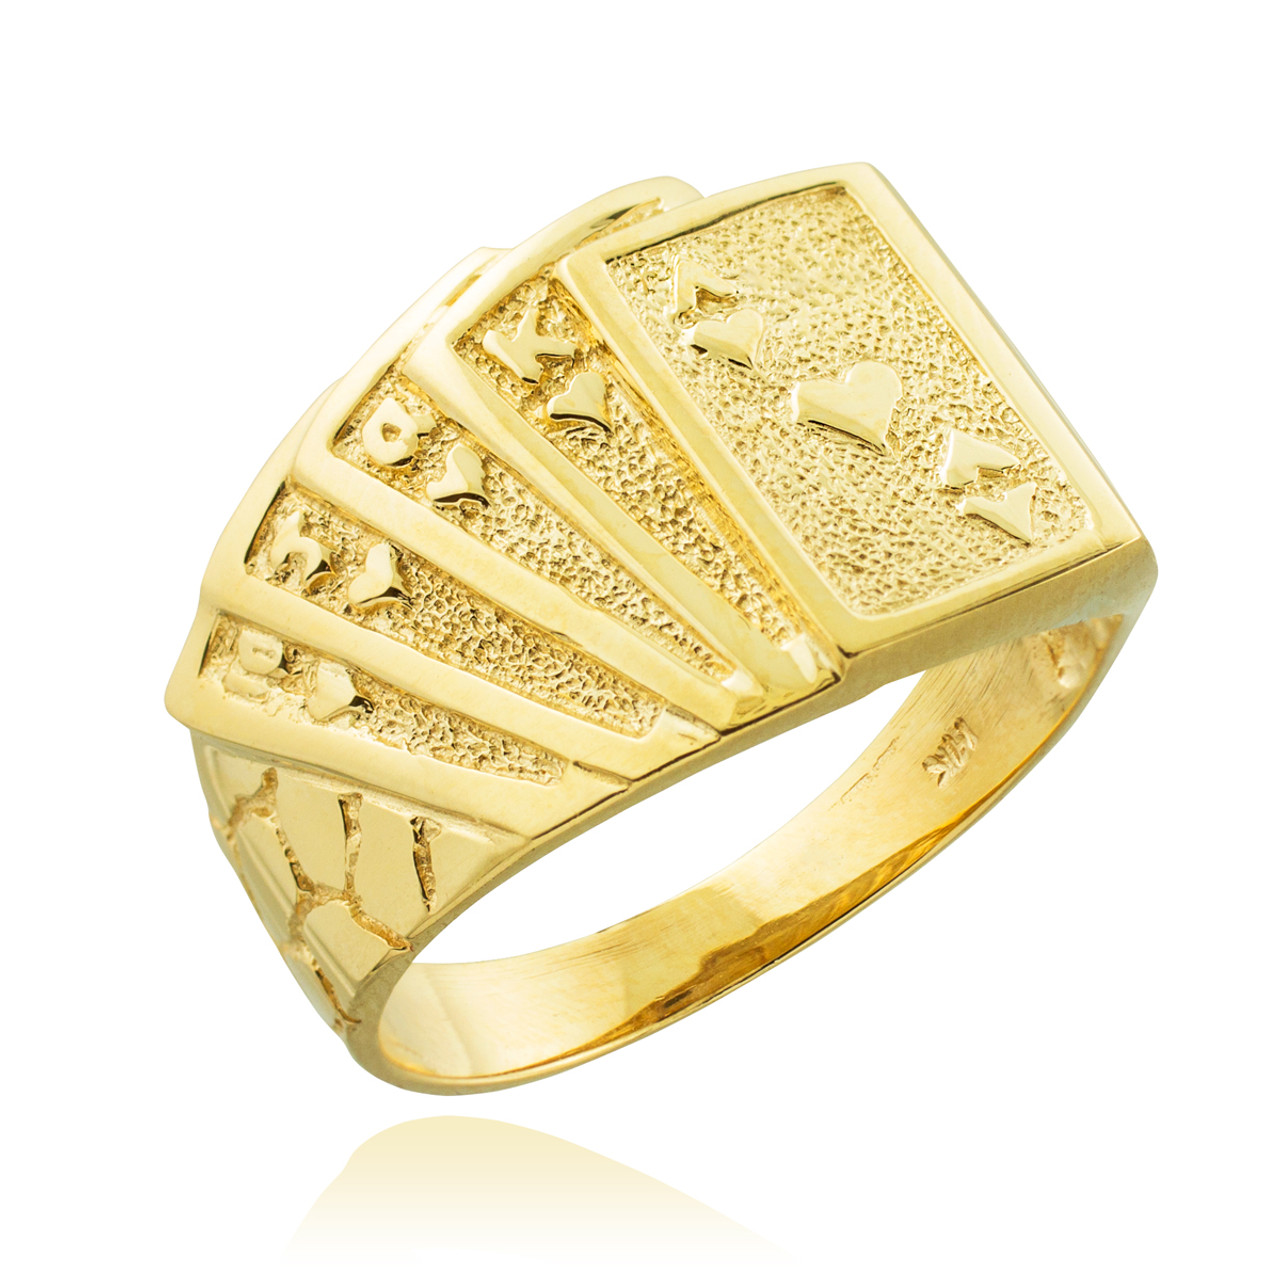 14k Yellow Gold Solid Satin Polished Royal Flush Pendant